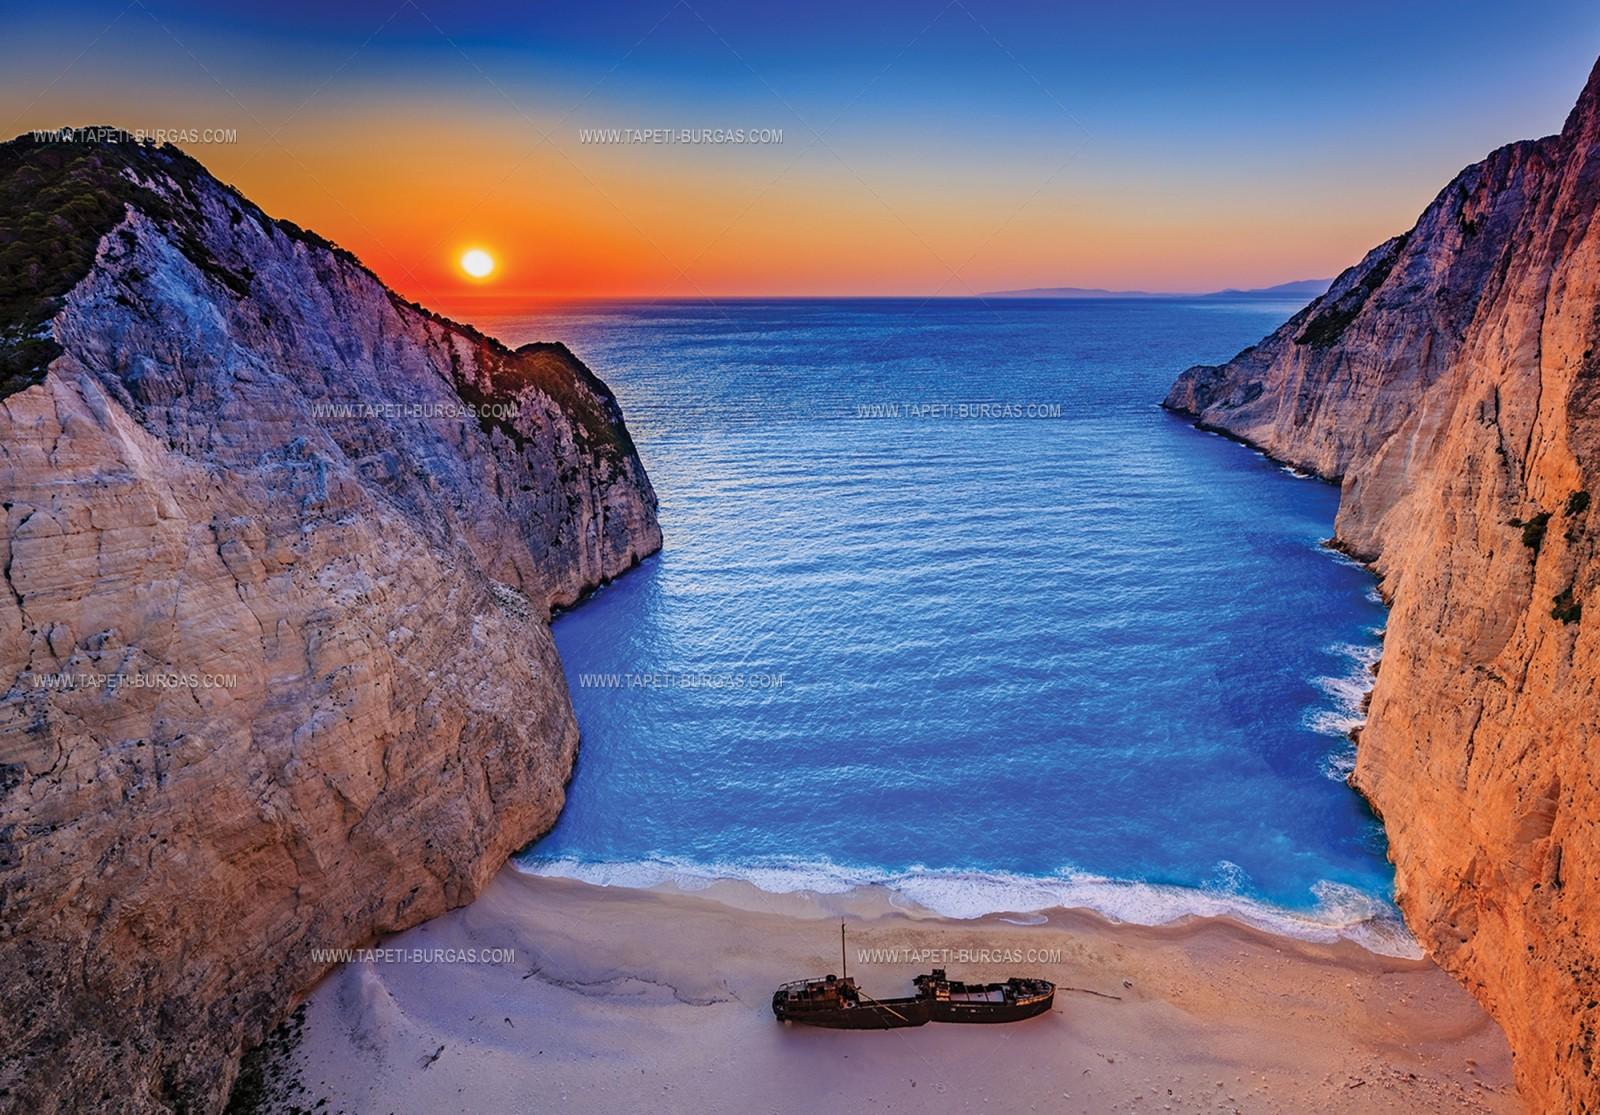 Фототапет Средиземноморски залив